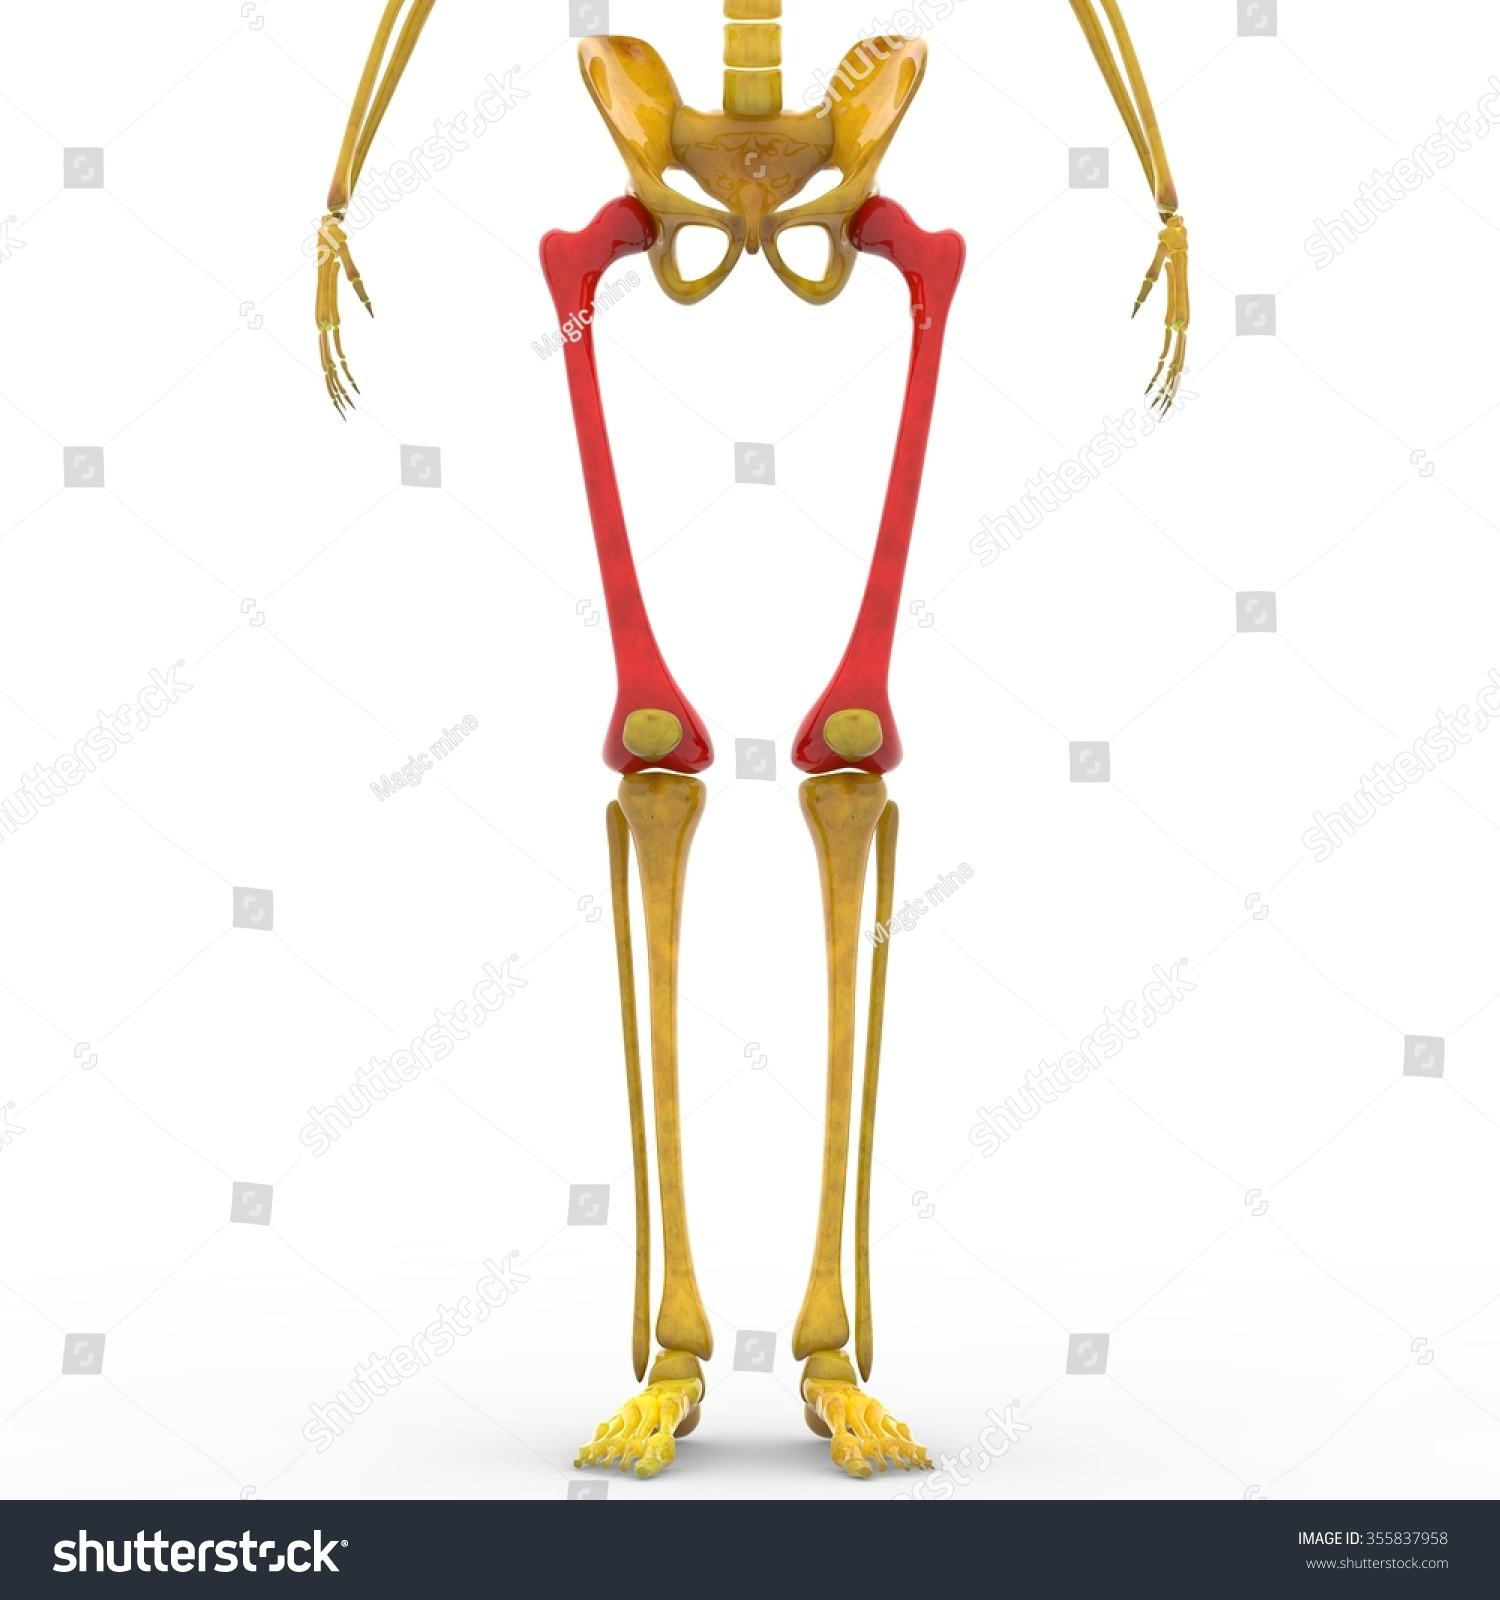 Image Gallery Skeleton Femur